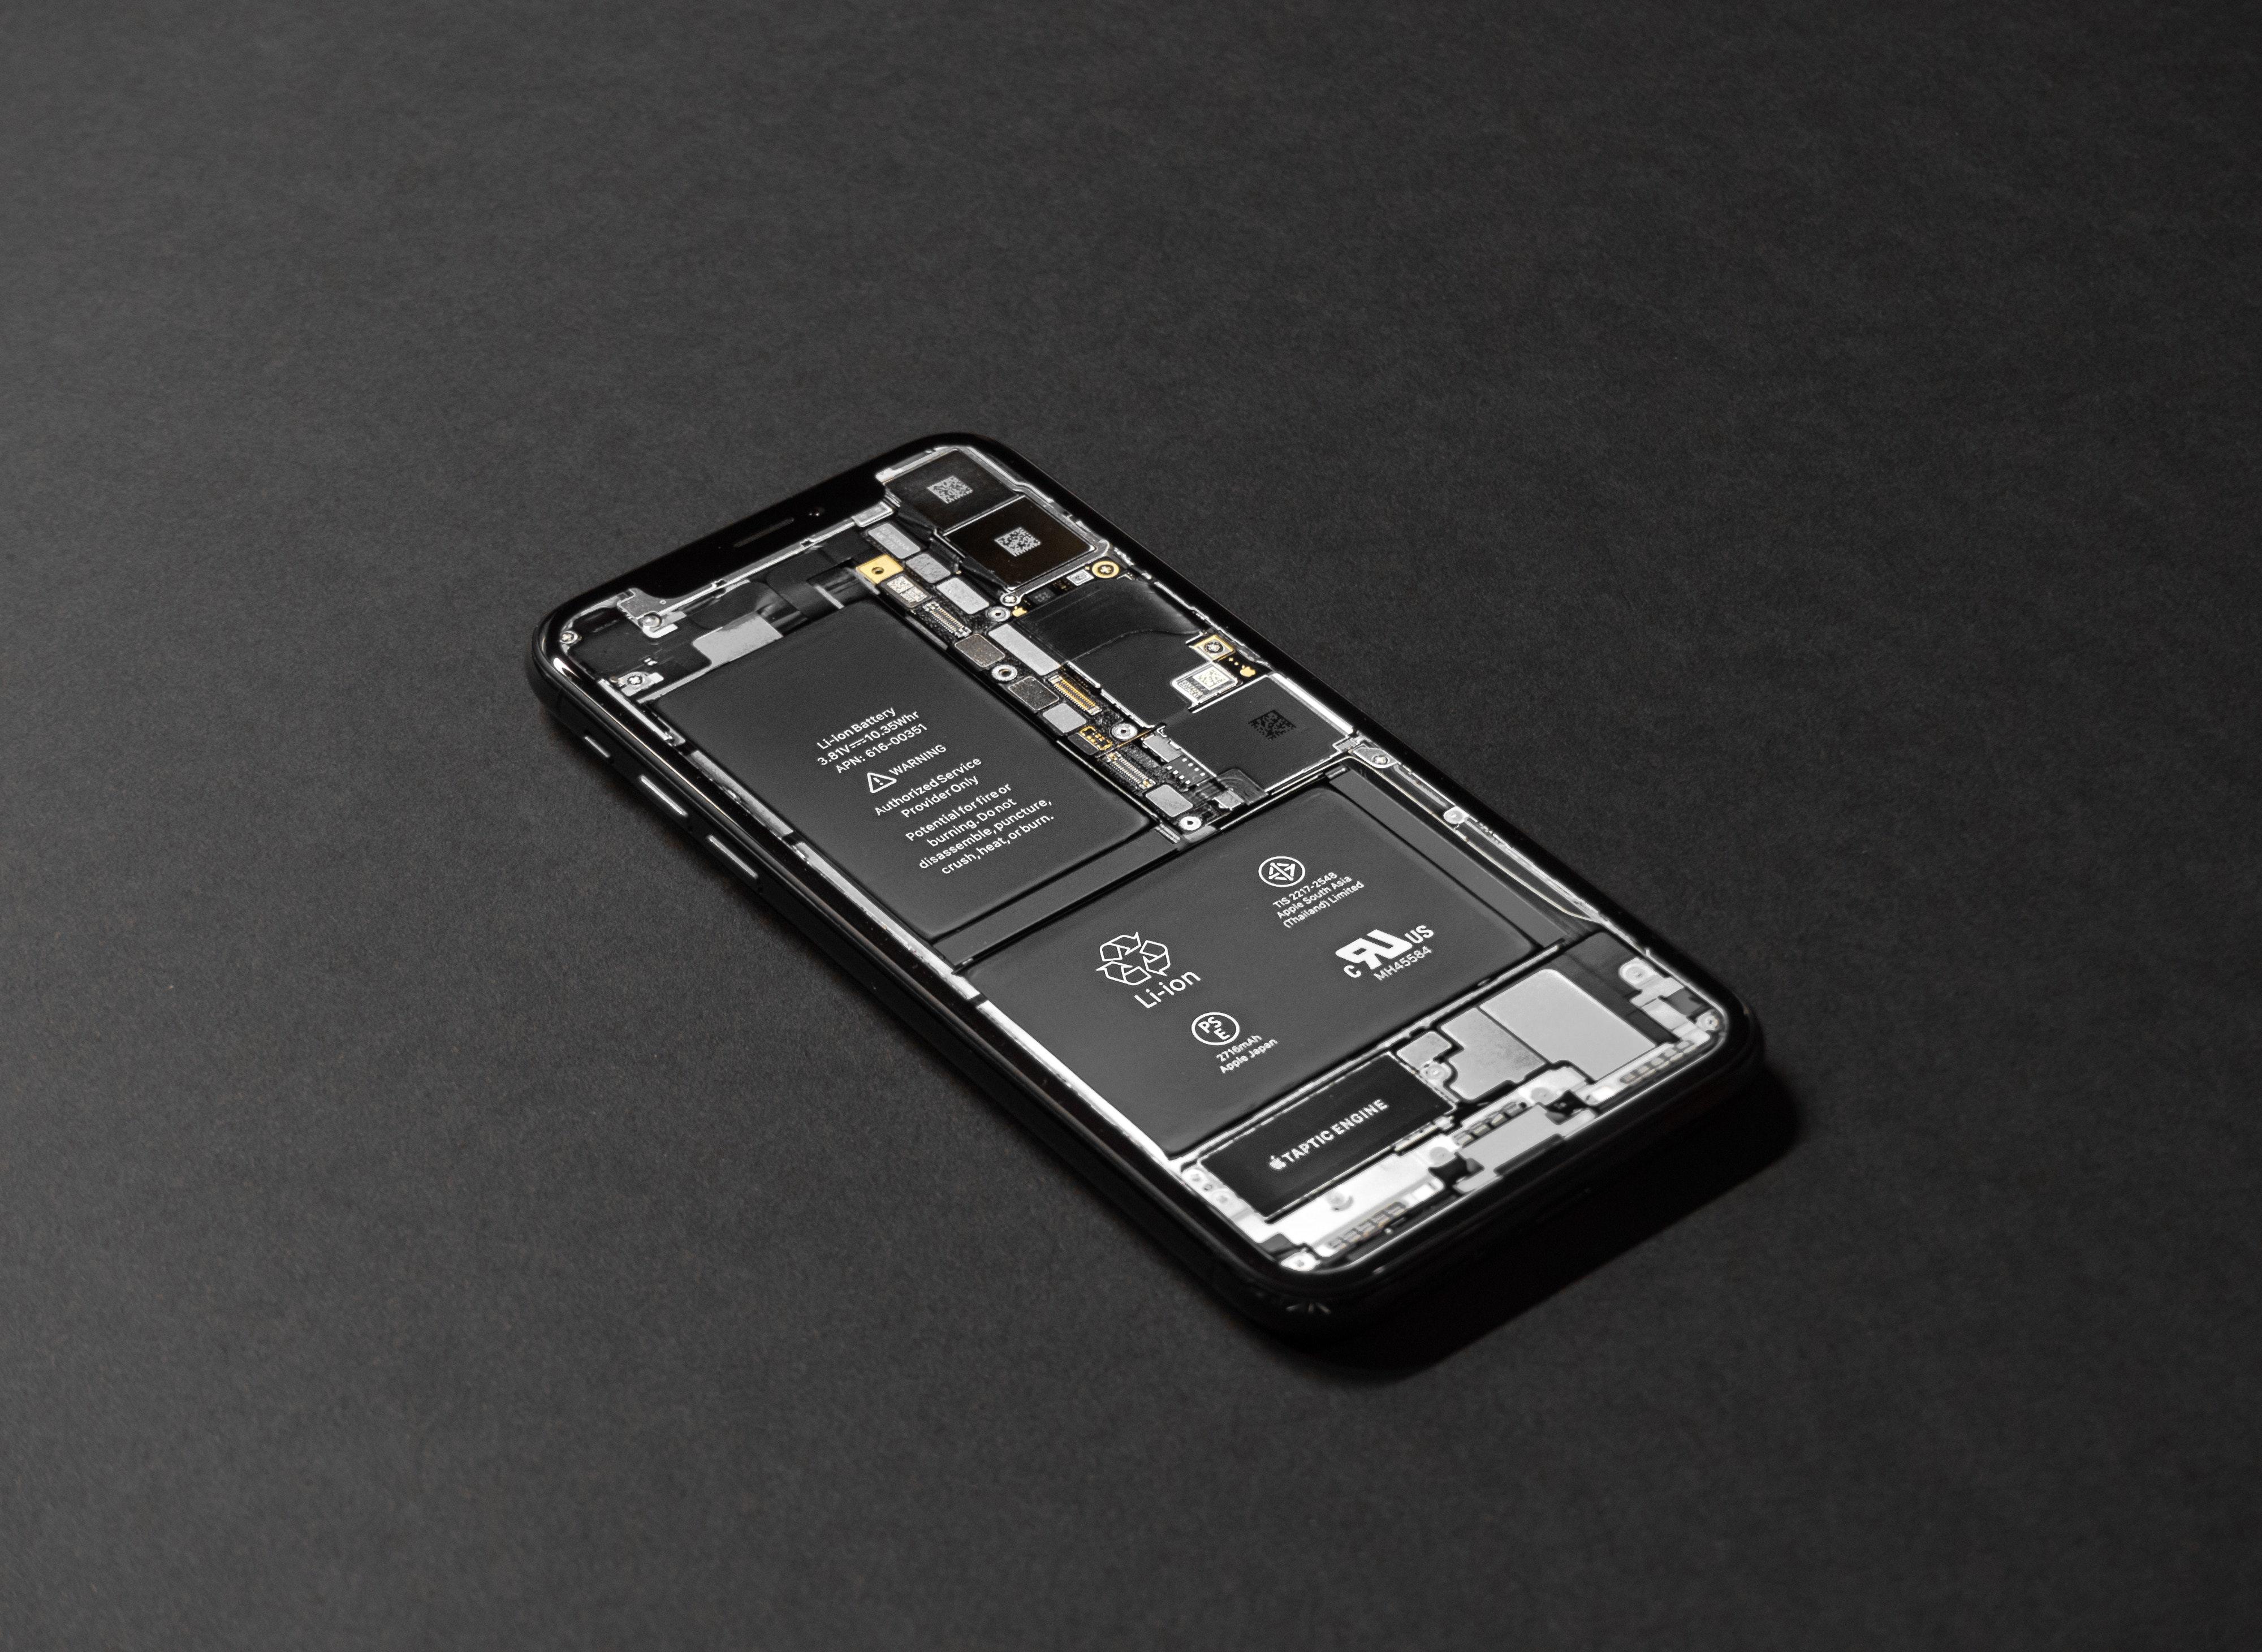 battery-black-background-cellphone-719399